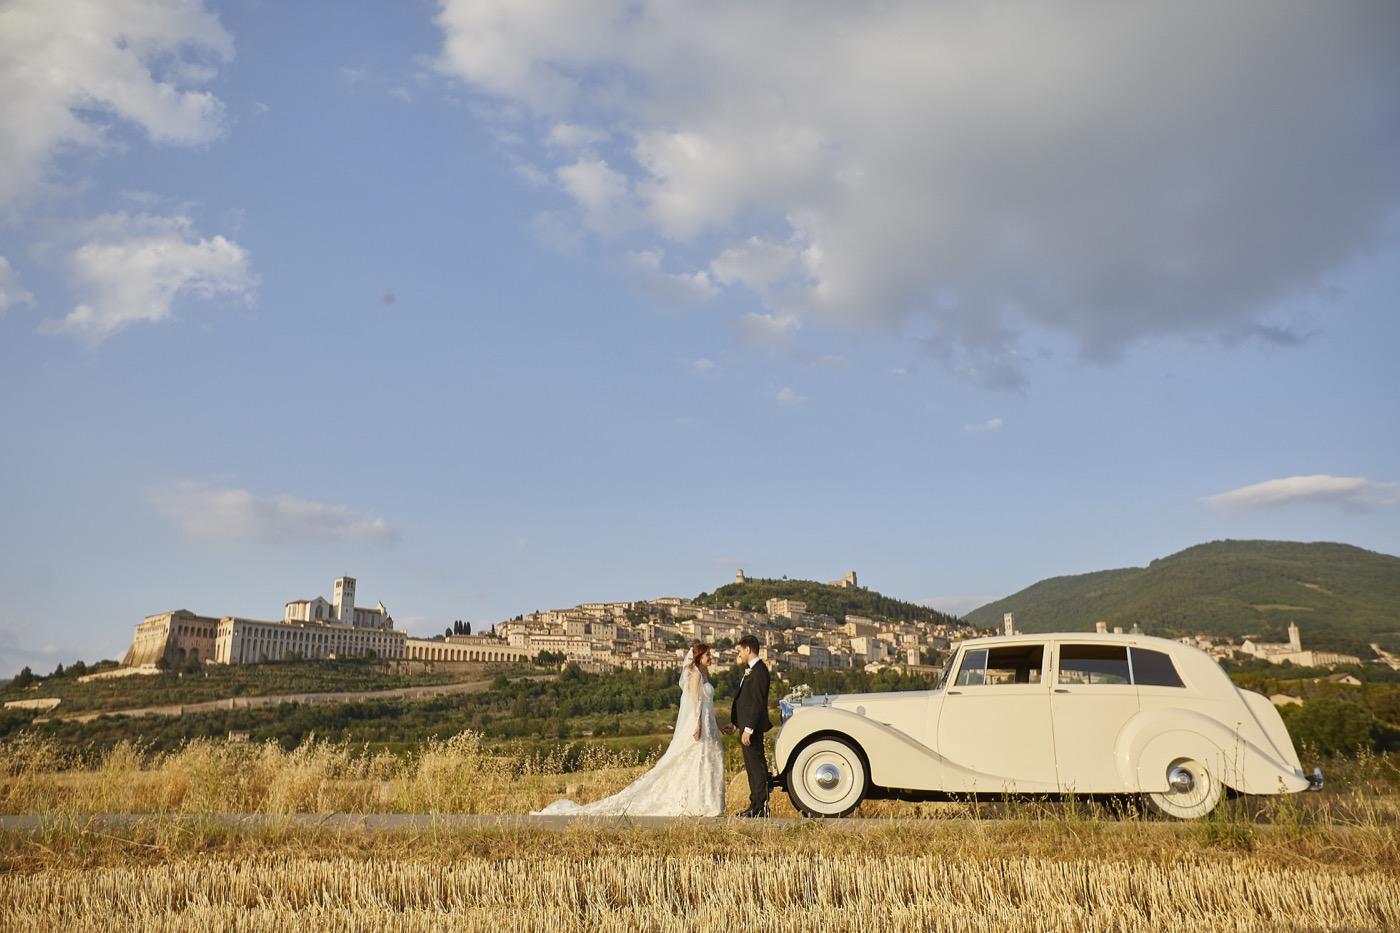 Claudio-Coppola-wedding-photographer-abbazia-7-frati-piegaro-69